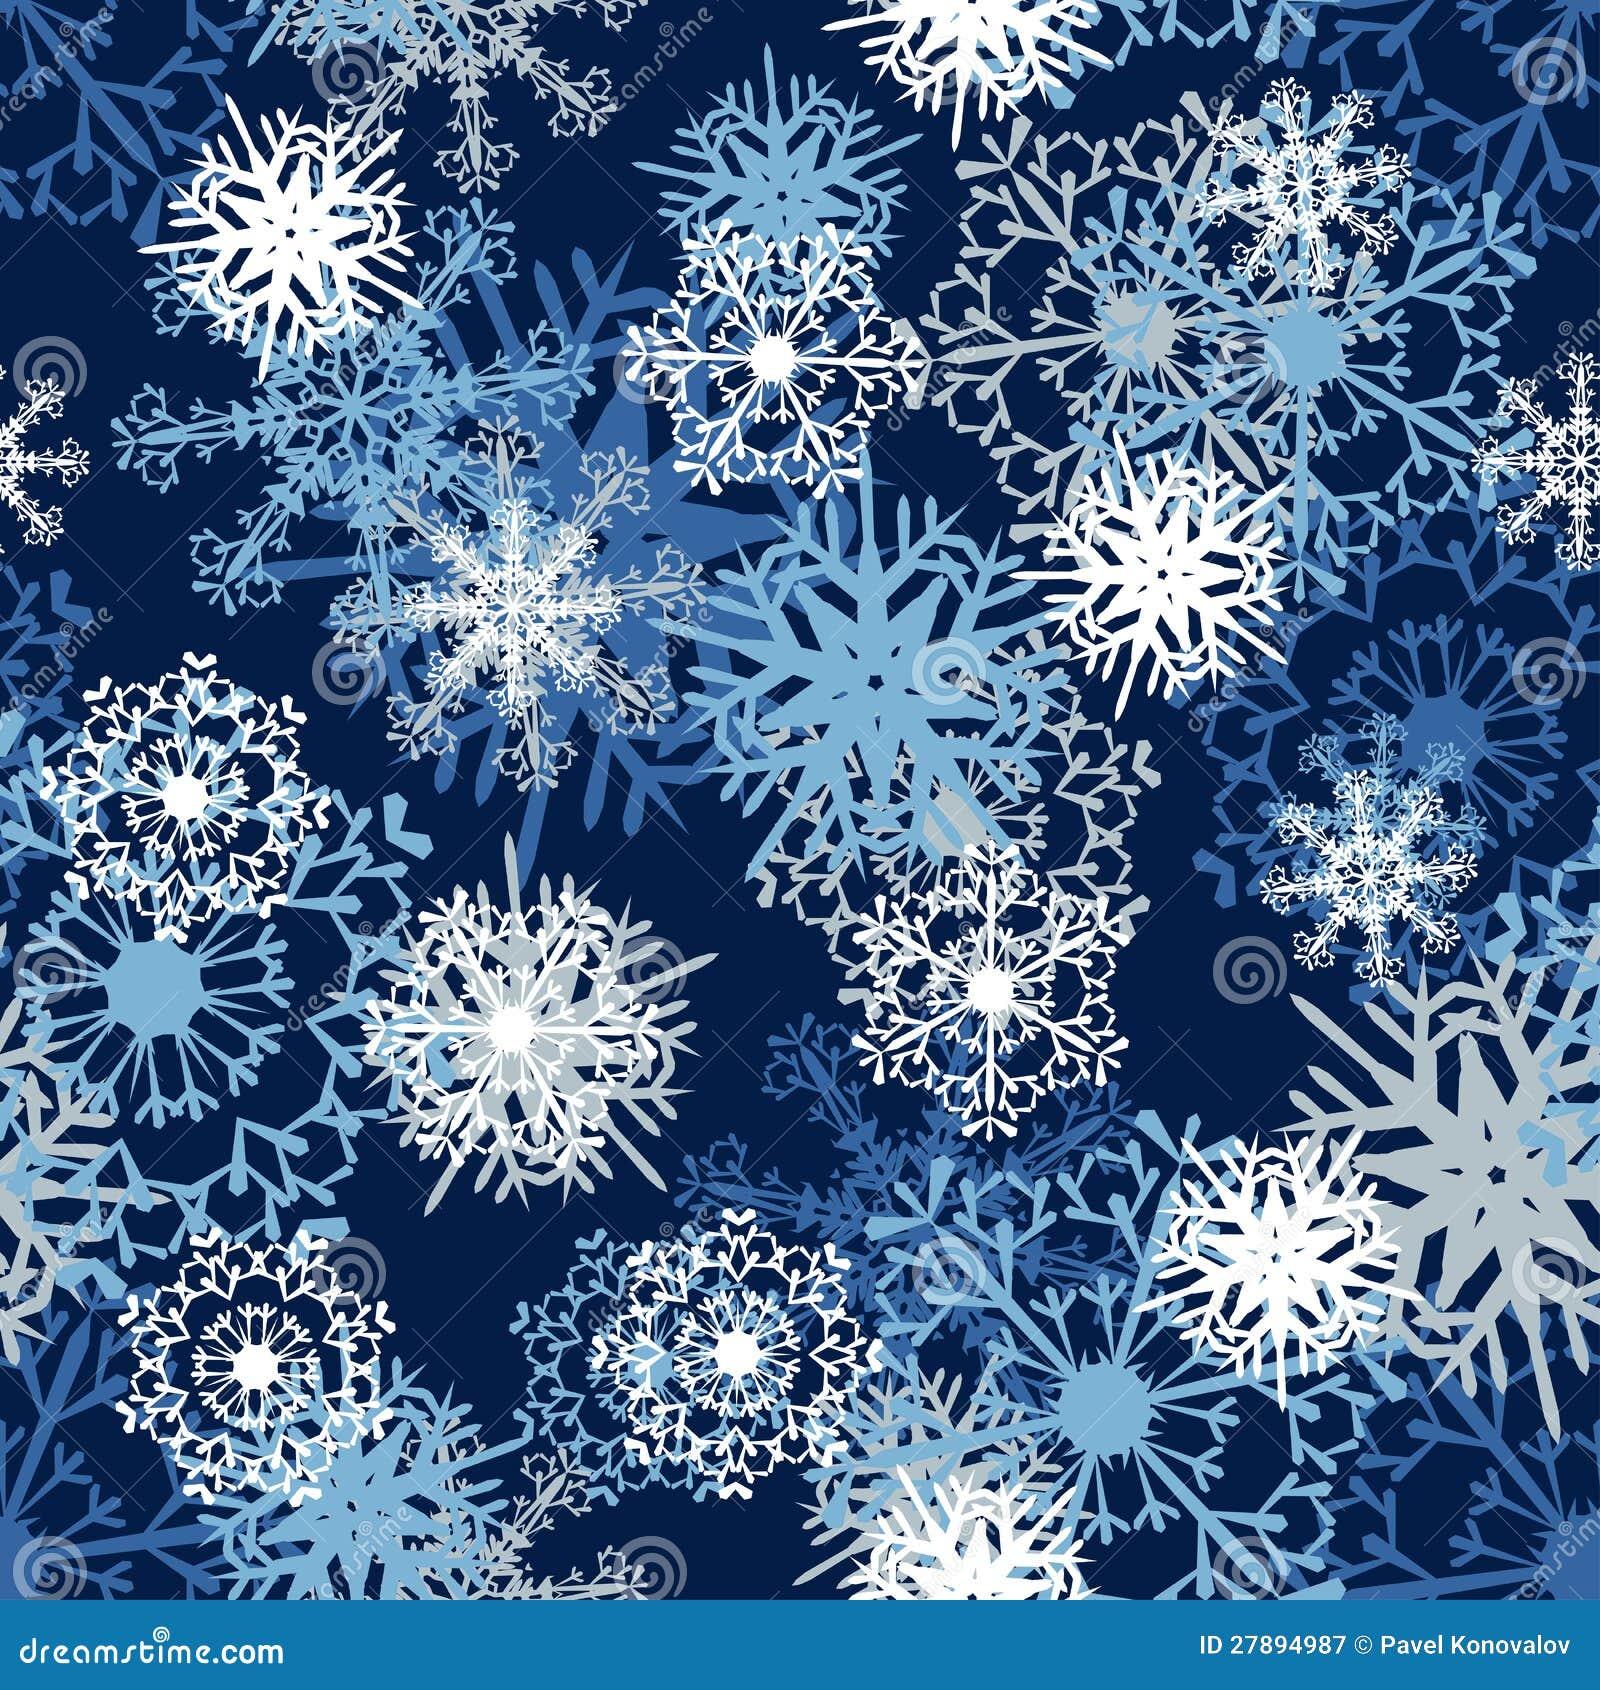 Snowflakes free vintage crochet patterns - Seamless Snowflake Patterns Fully Editable Eps 8 Vector Illustration